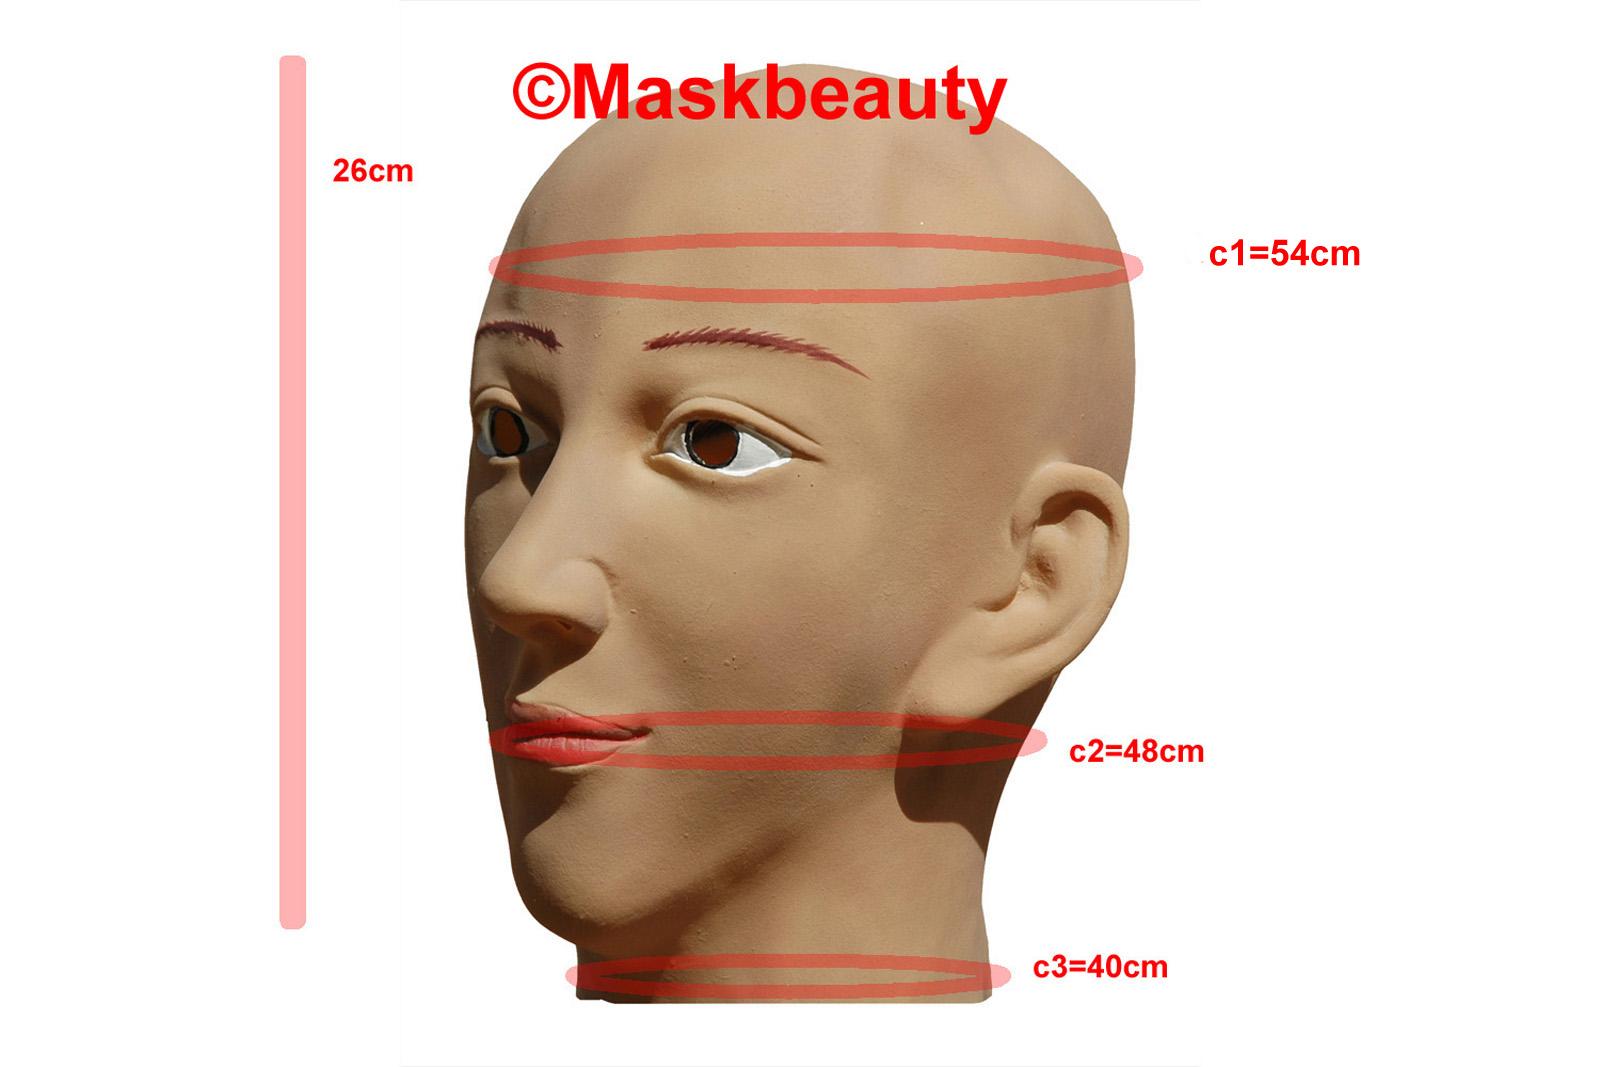 Sexy Halloween Disguise Foam Latex Full Head Female Maskbeauty Mask